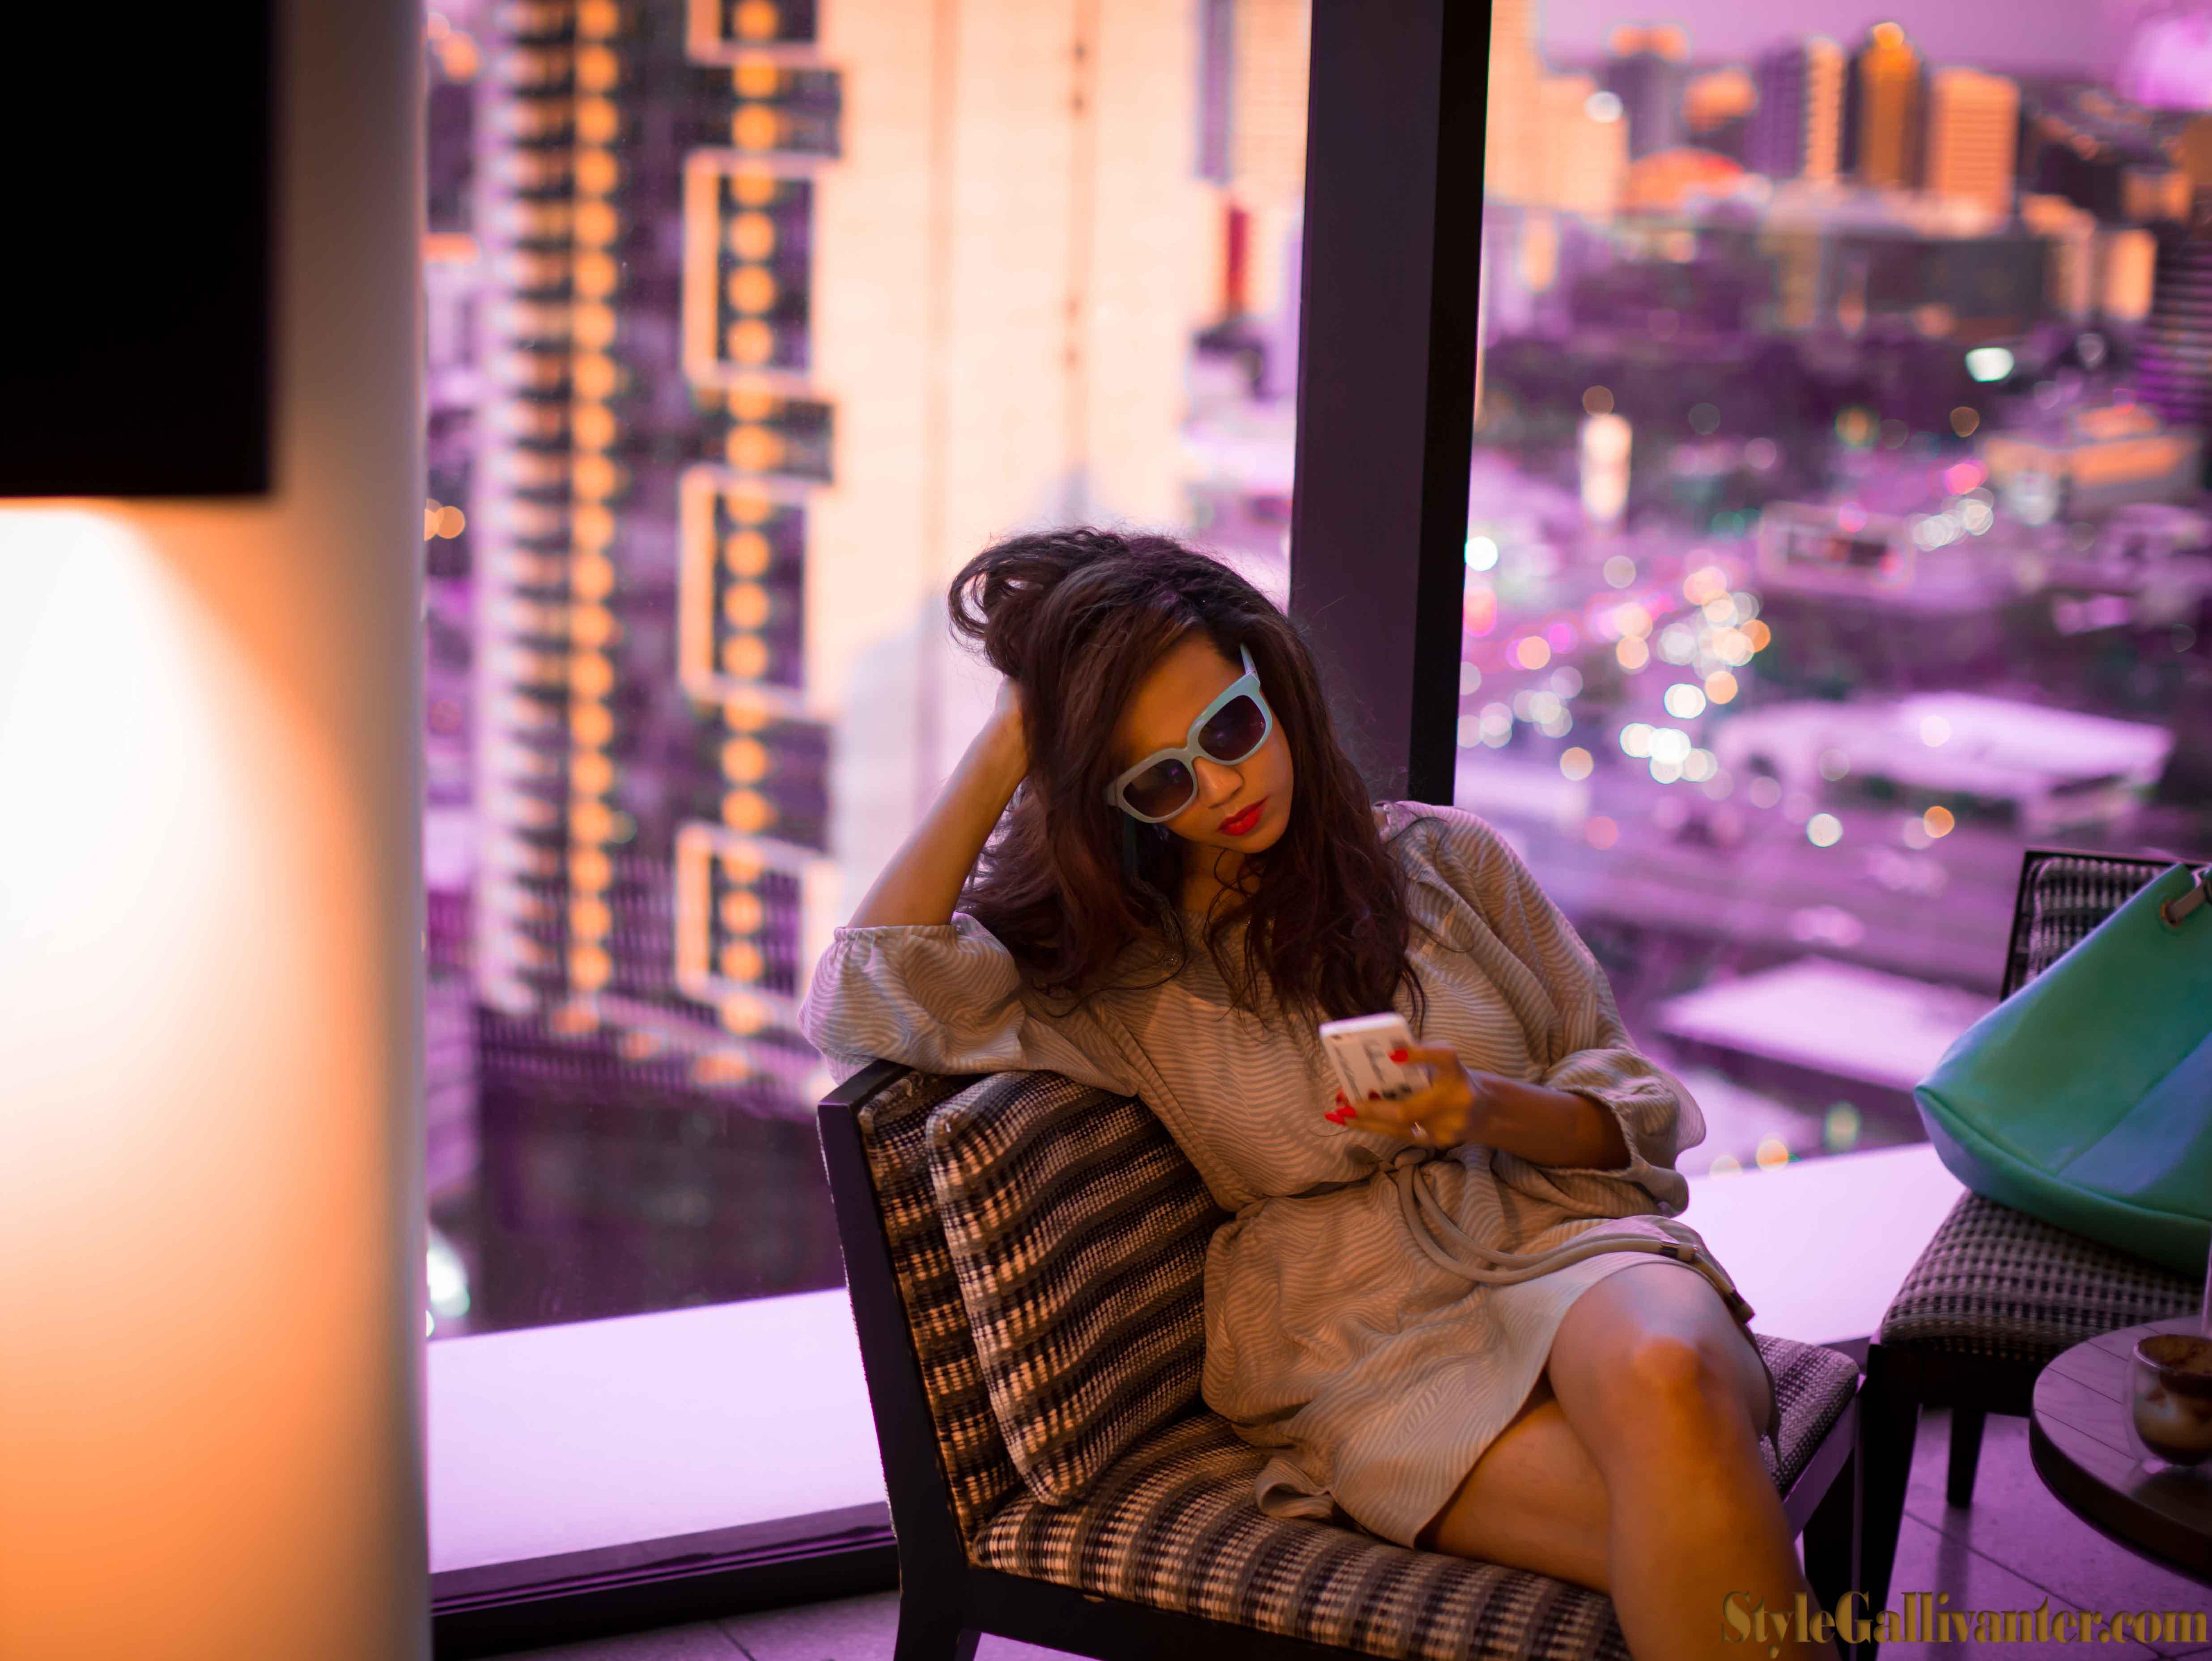 elegant-trends_afro-hair-straightened-best-coffee-melbourne_sheer-armani-dress_best-freelance-stylists-melbourne_best-personal-stylist-melbourne_best-image-consultant-melbourne_best-editorial-stylist_celebrity-stylists-melbourne-4